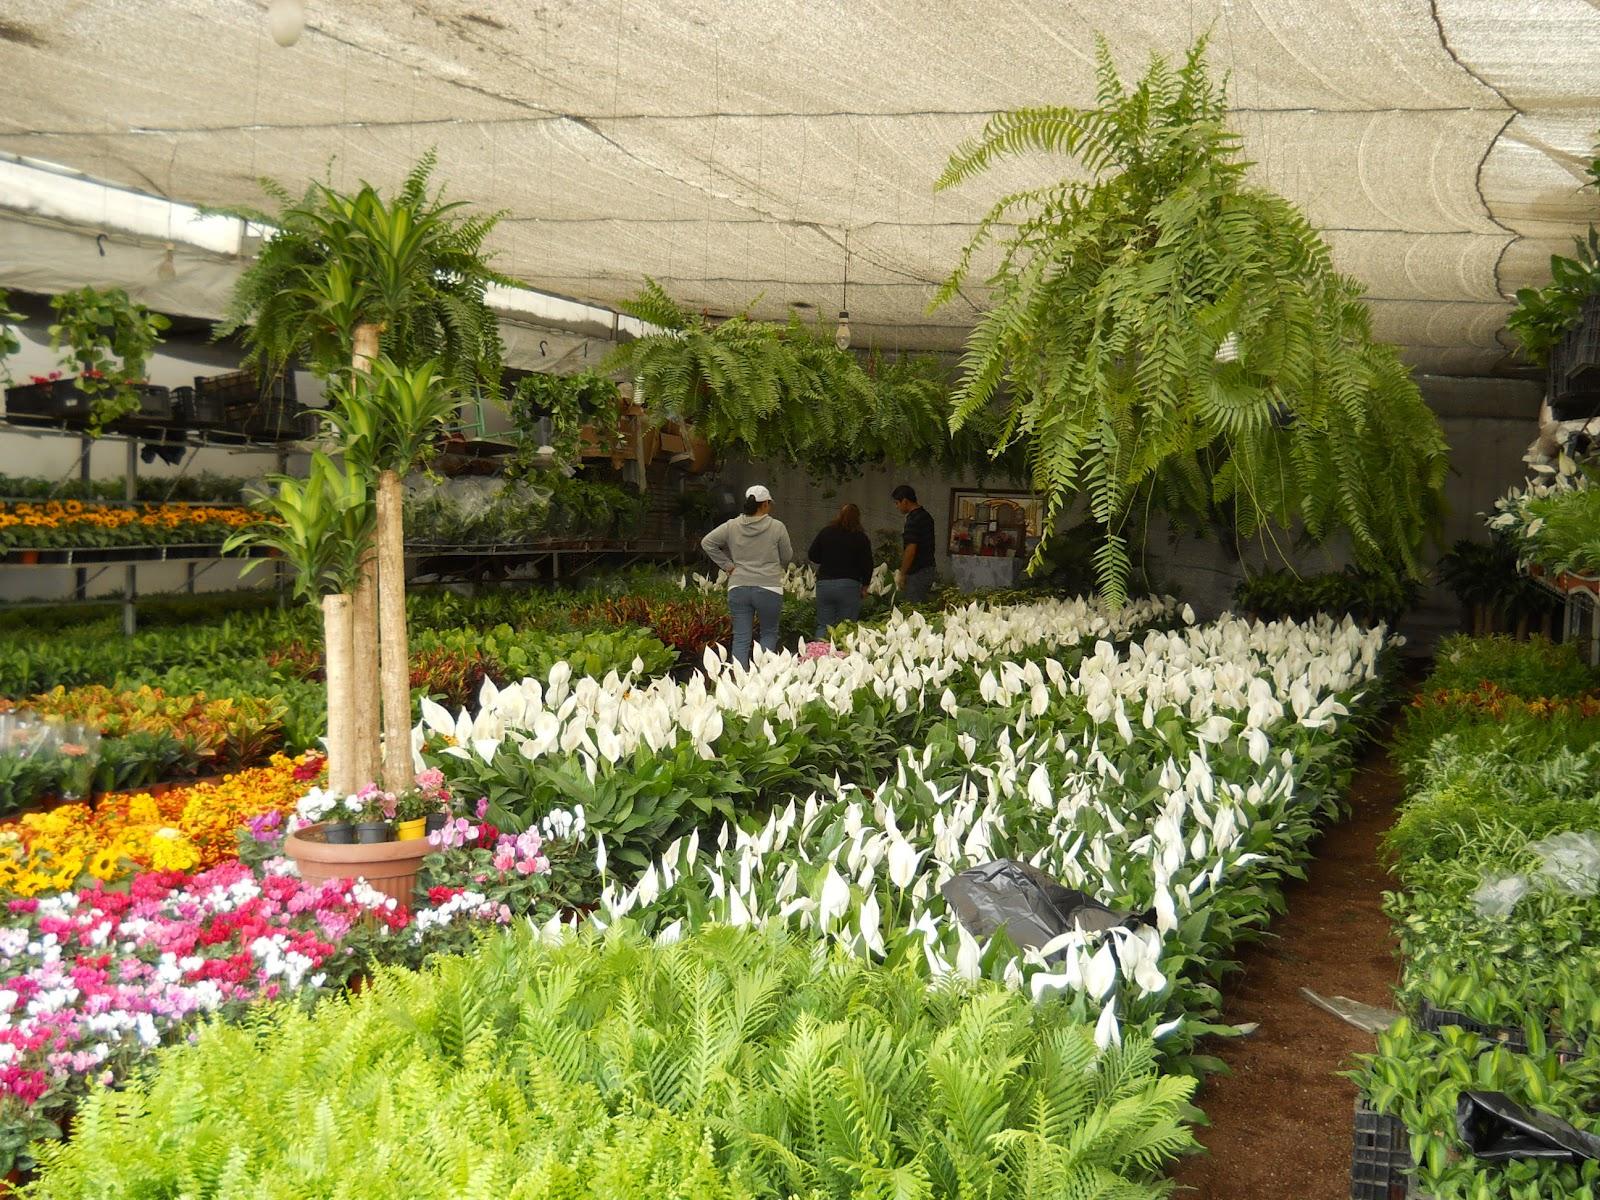 Traves as por el mundo madre selva un mercado de flores - Madreselva en maceta ...